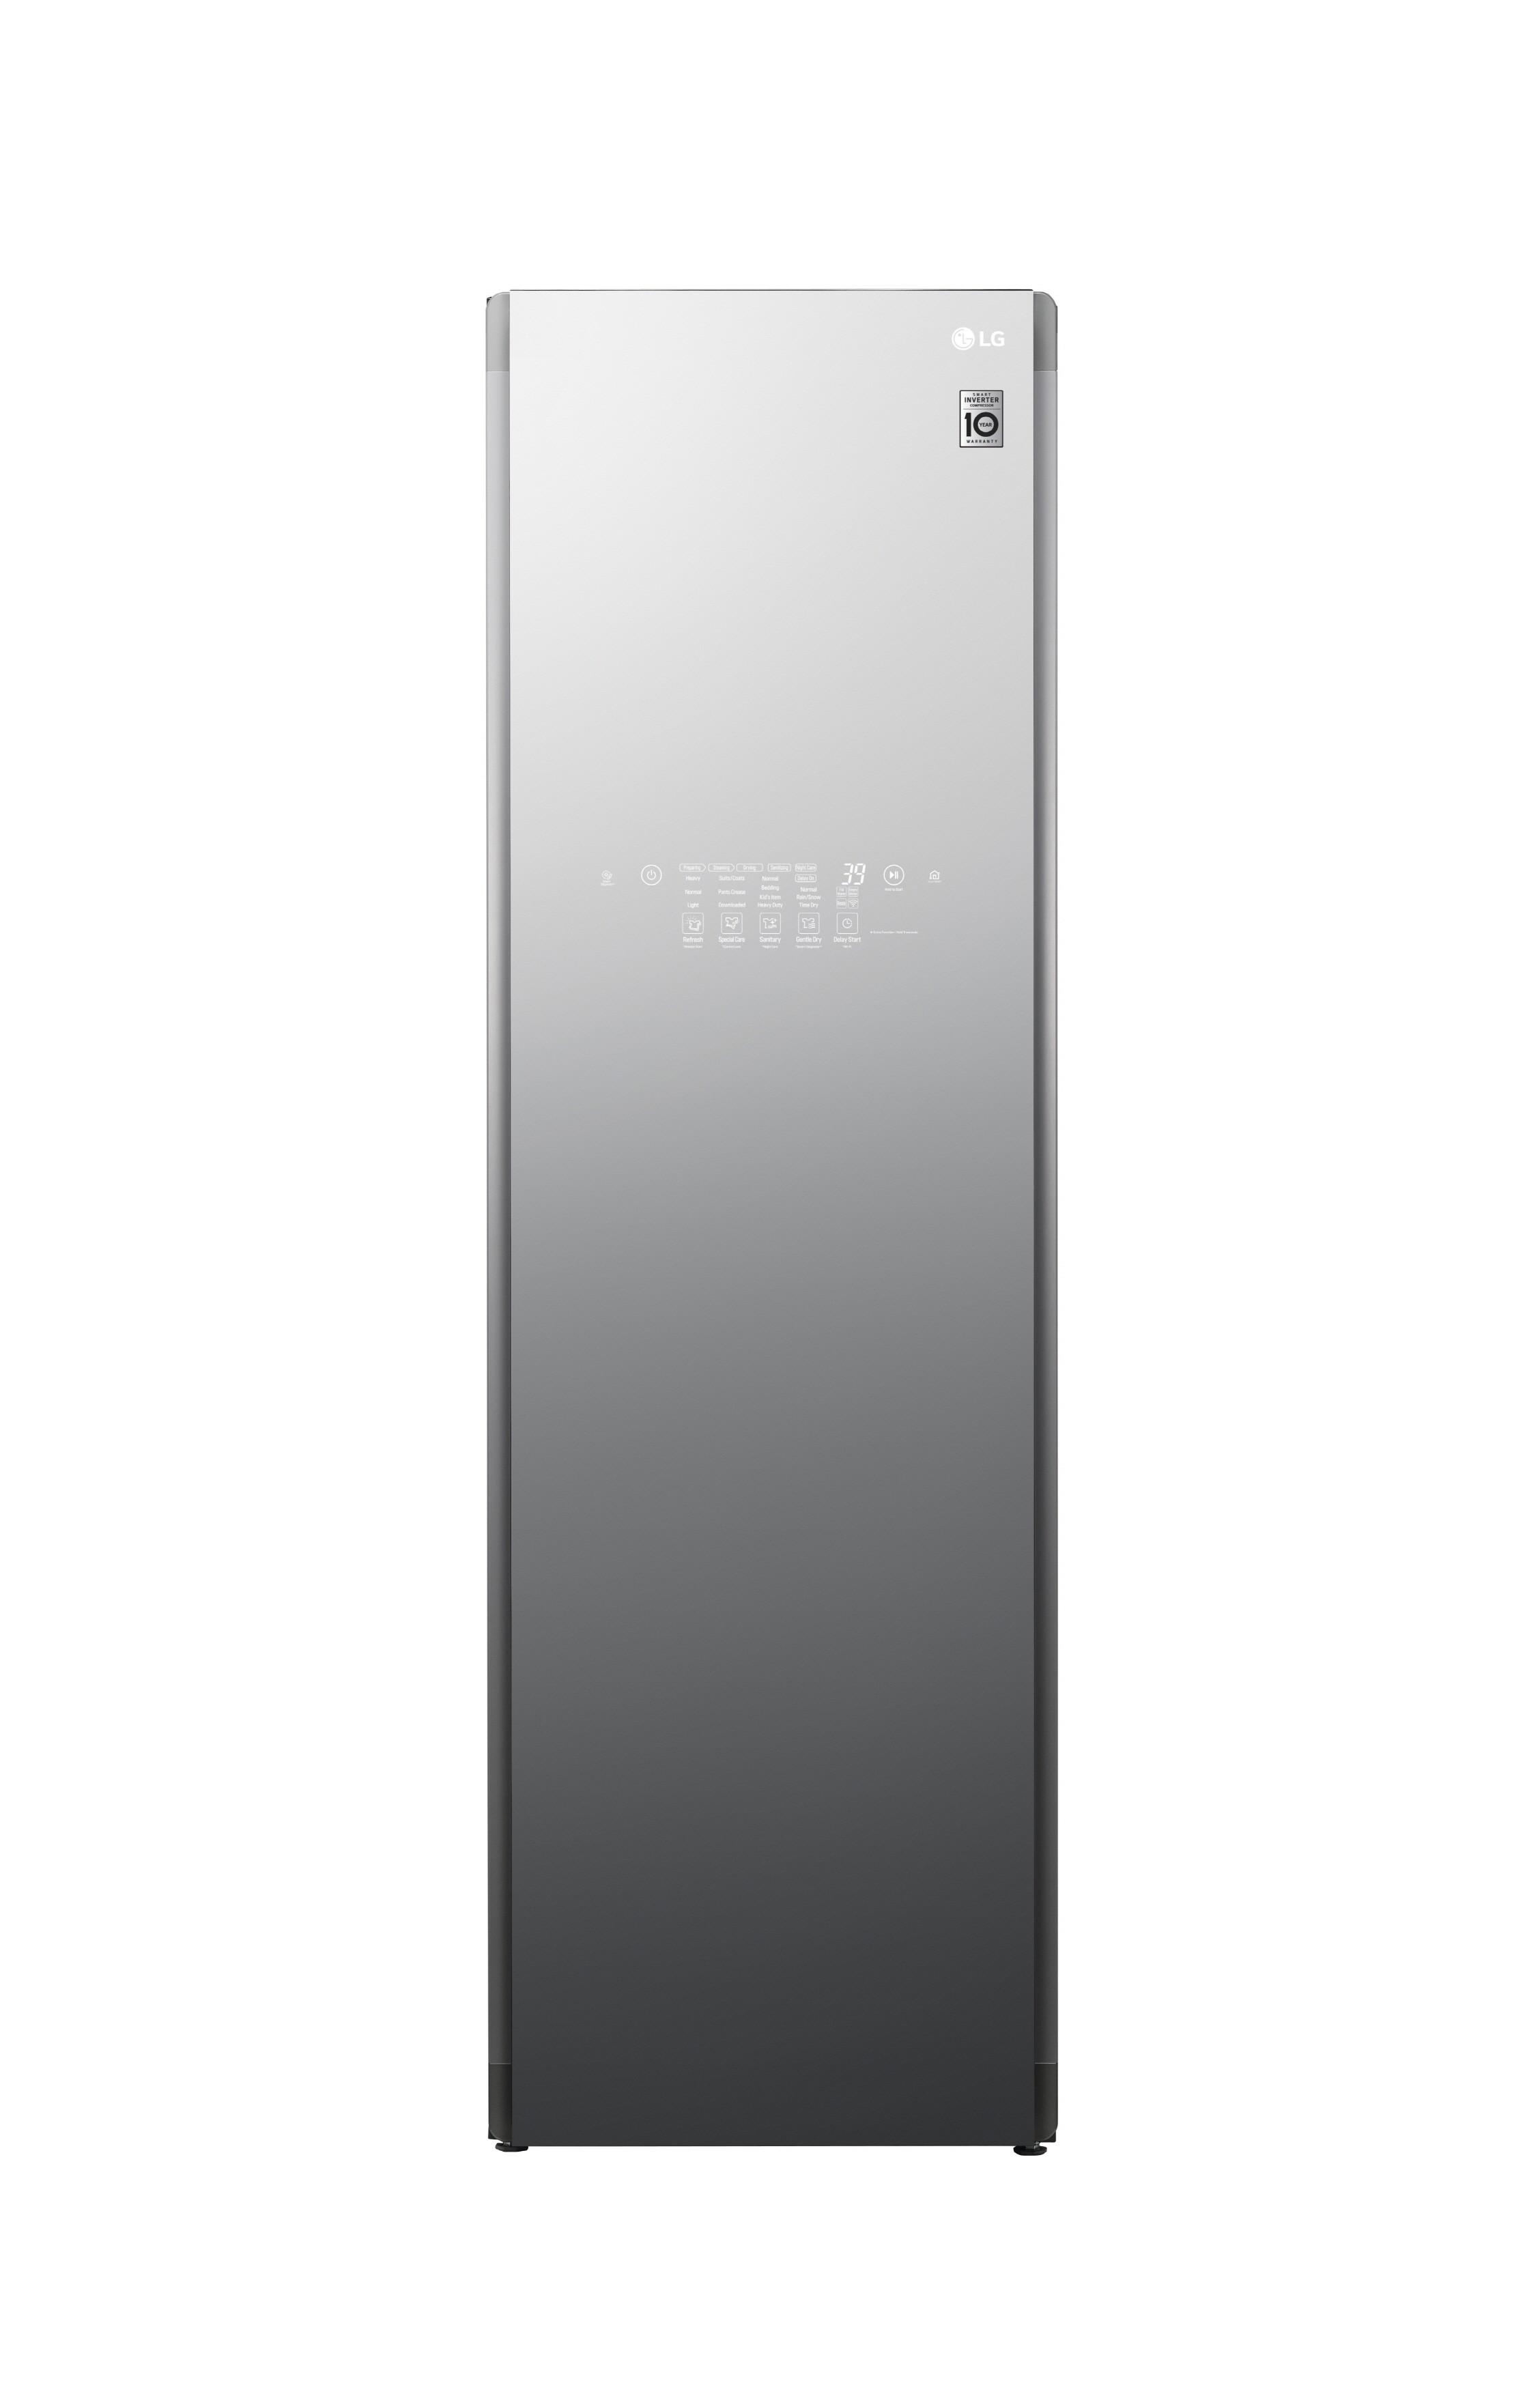 Front view of LG Styler Black Tinted Mirror Glass Door with 5 hangers